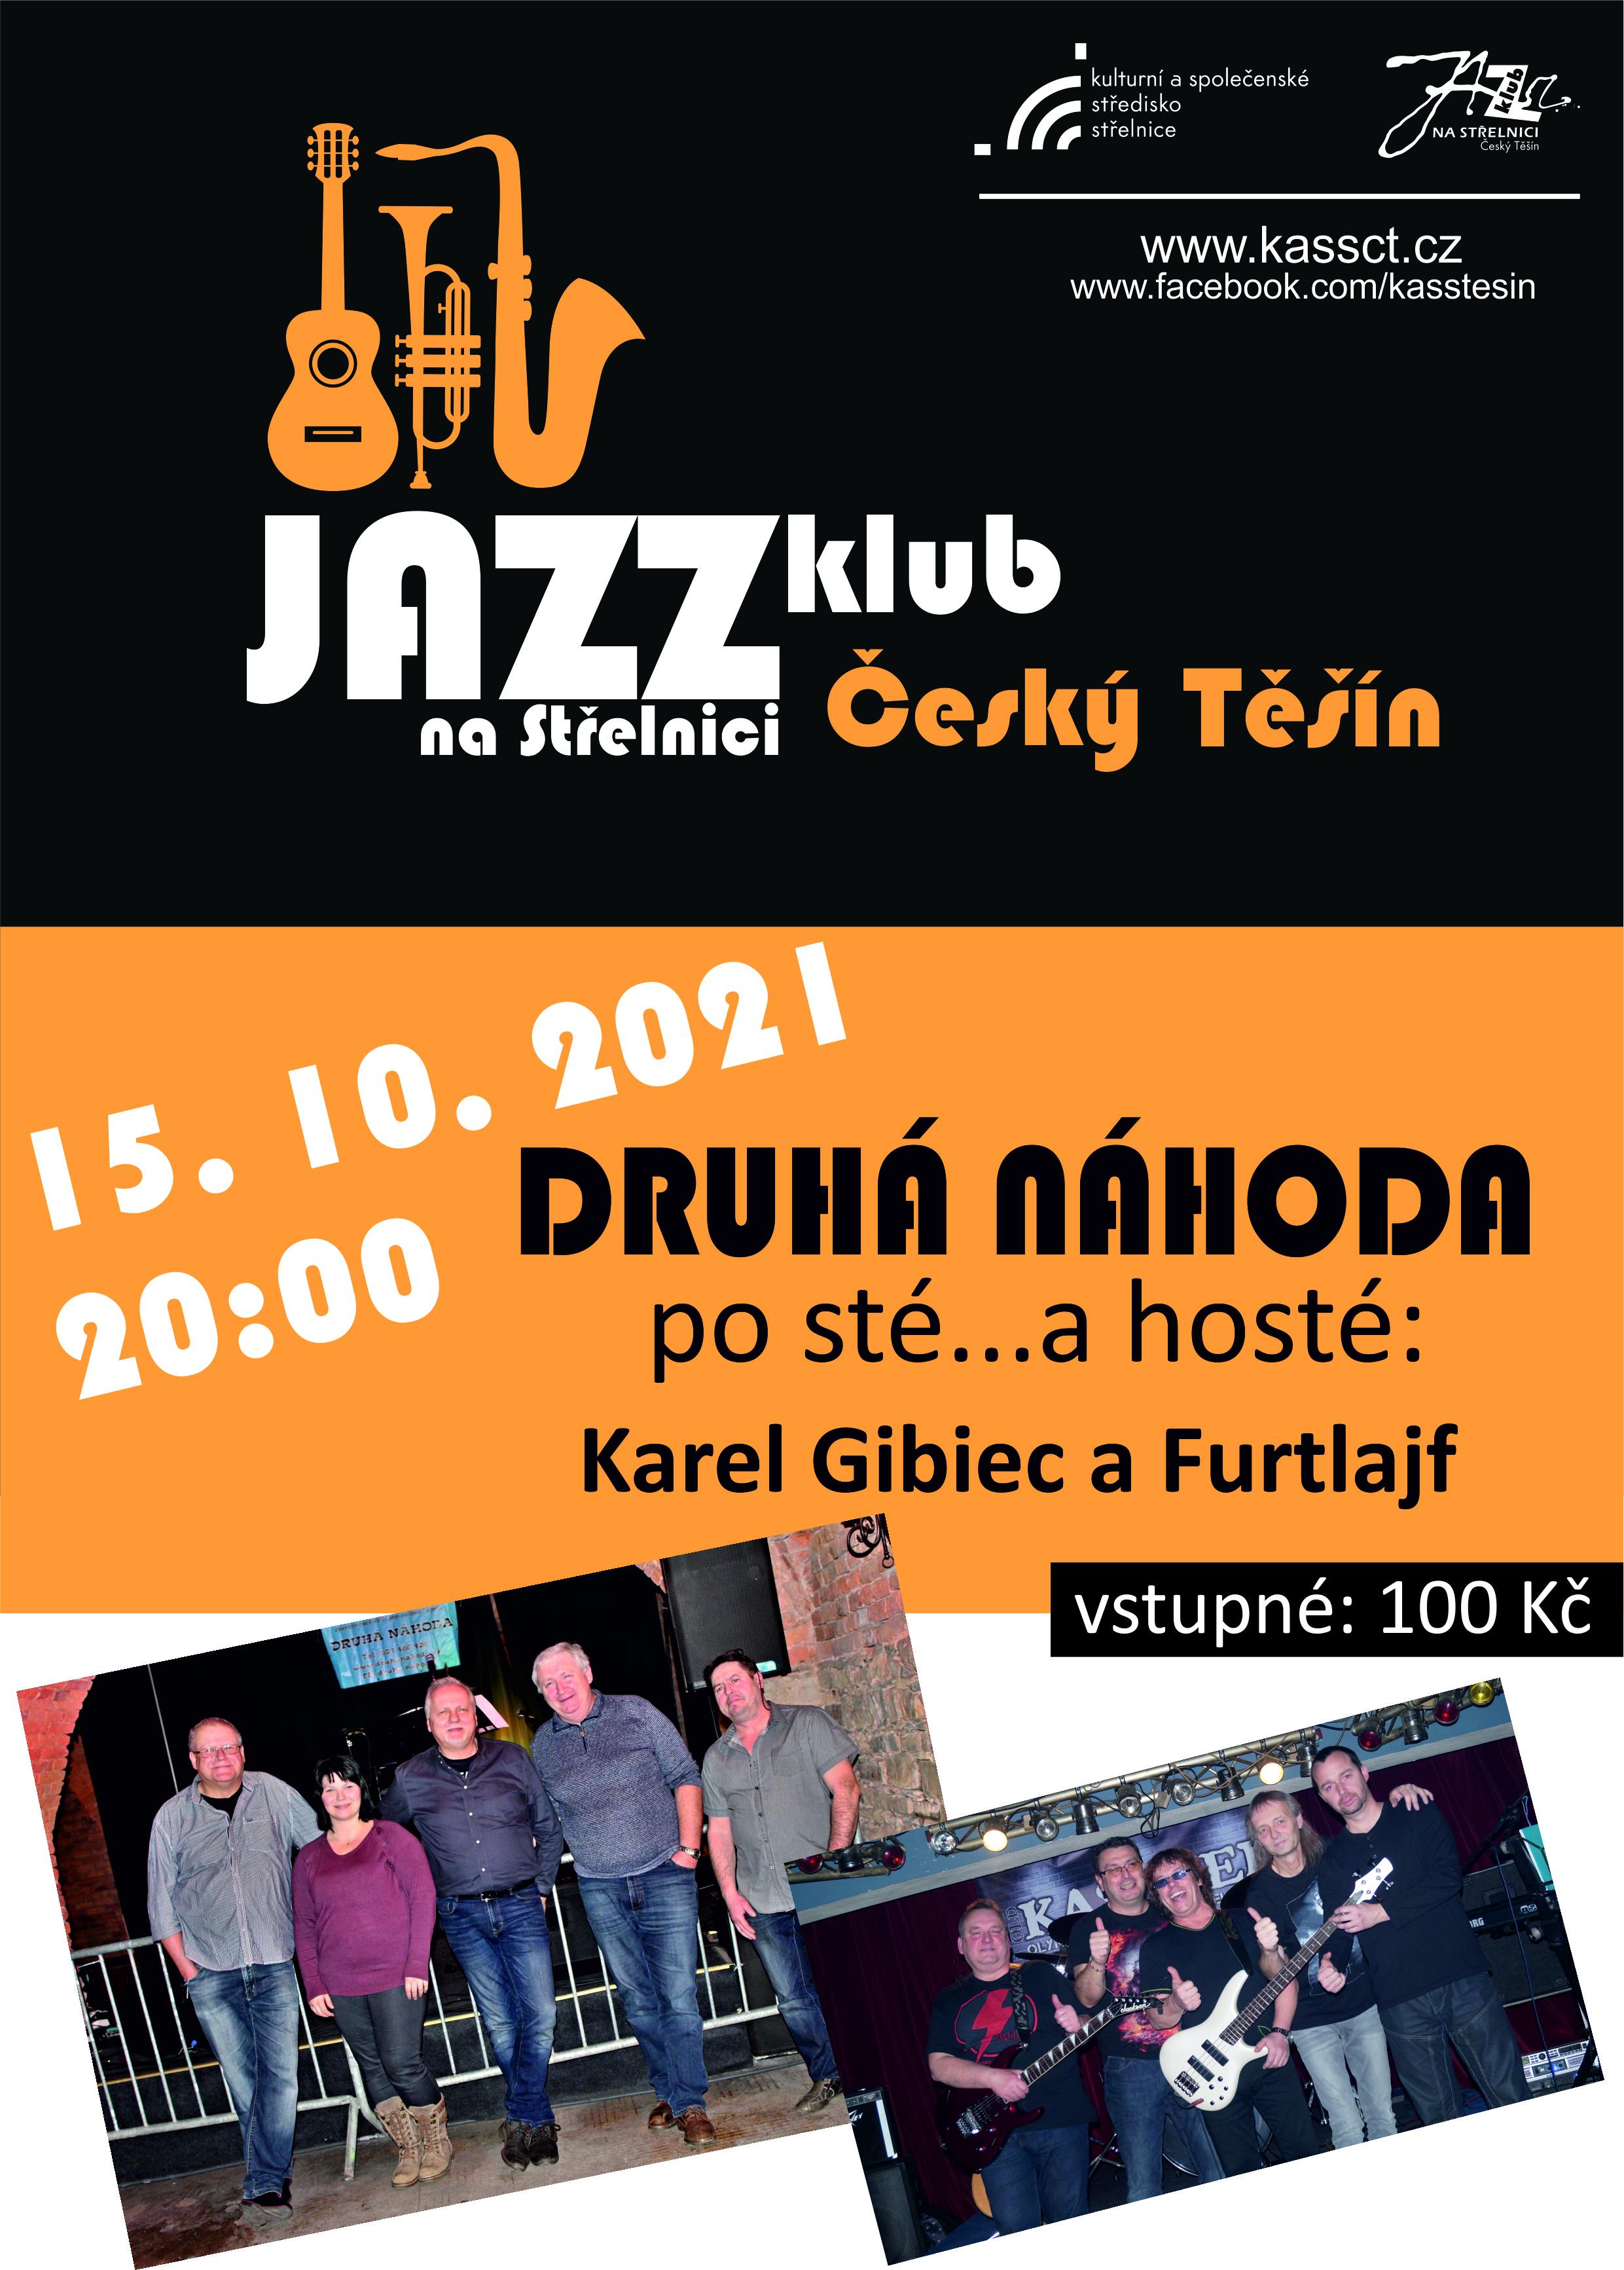 plakát na koncert v Jazzklubu 15.10. 2021 od 20:00 hod, Druhá náhoda, Furtlajf a Karel Gibiec